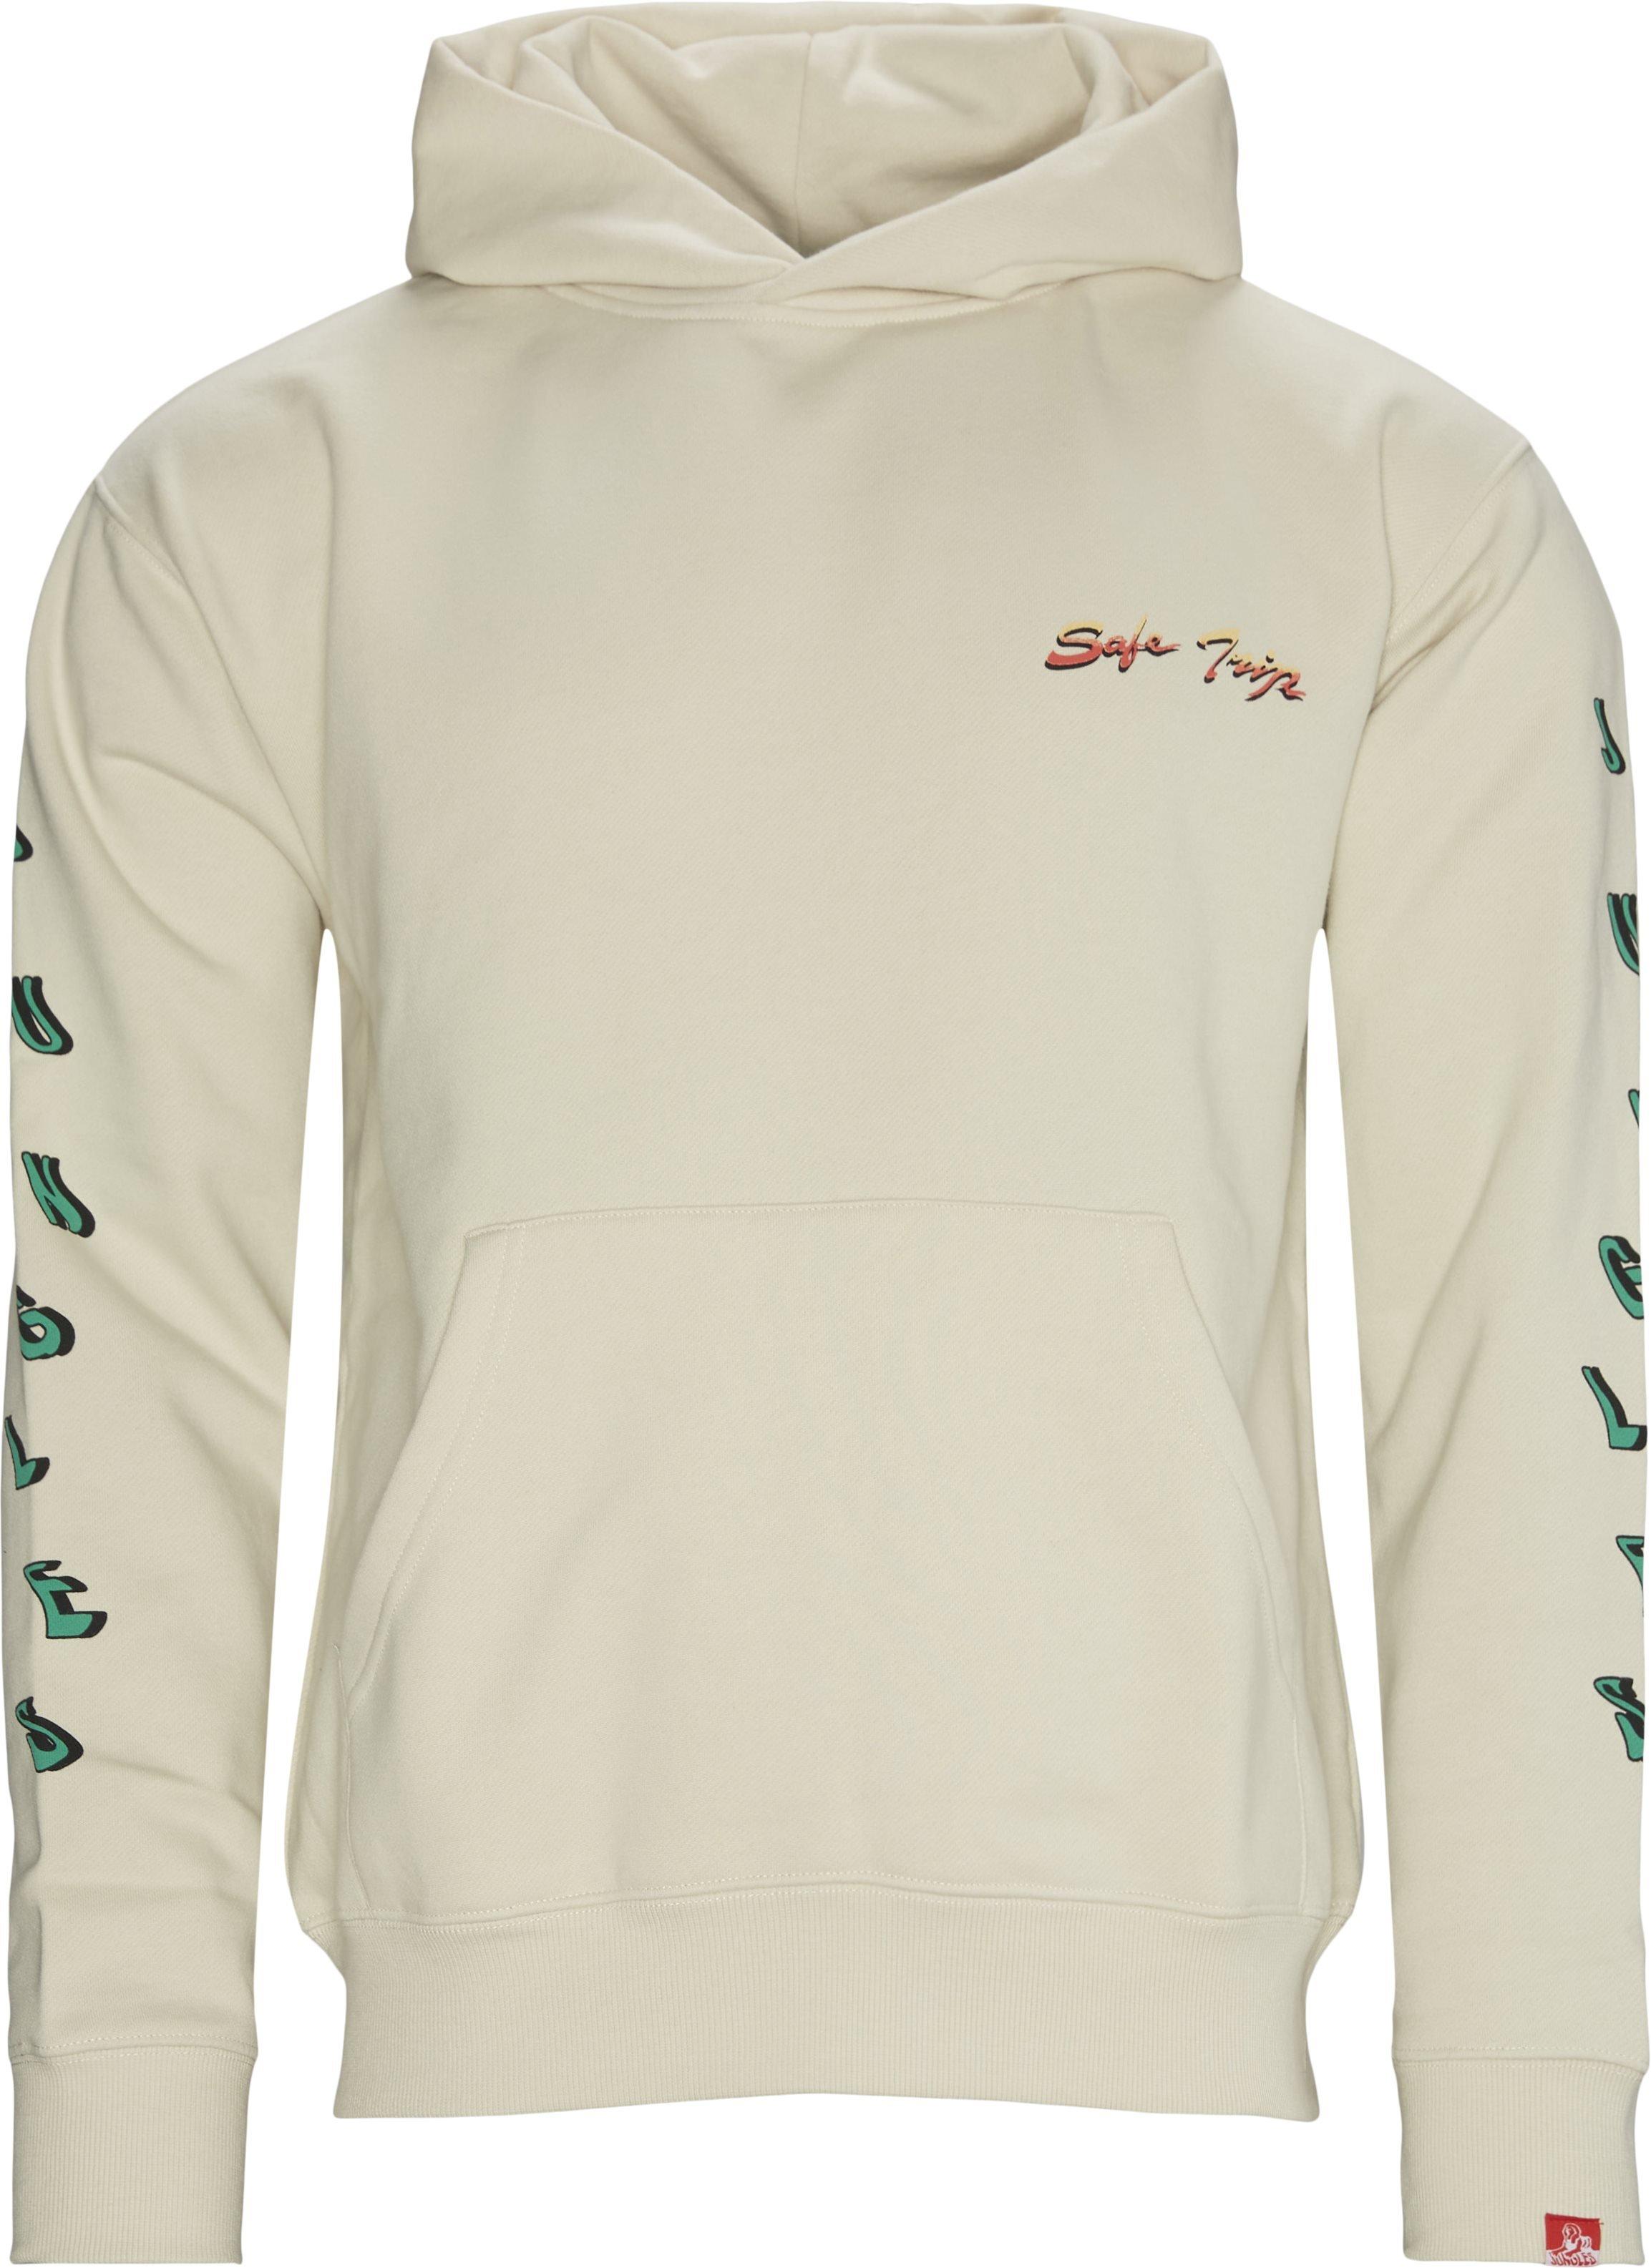 Sweatshirts - Regular fit - Sand